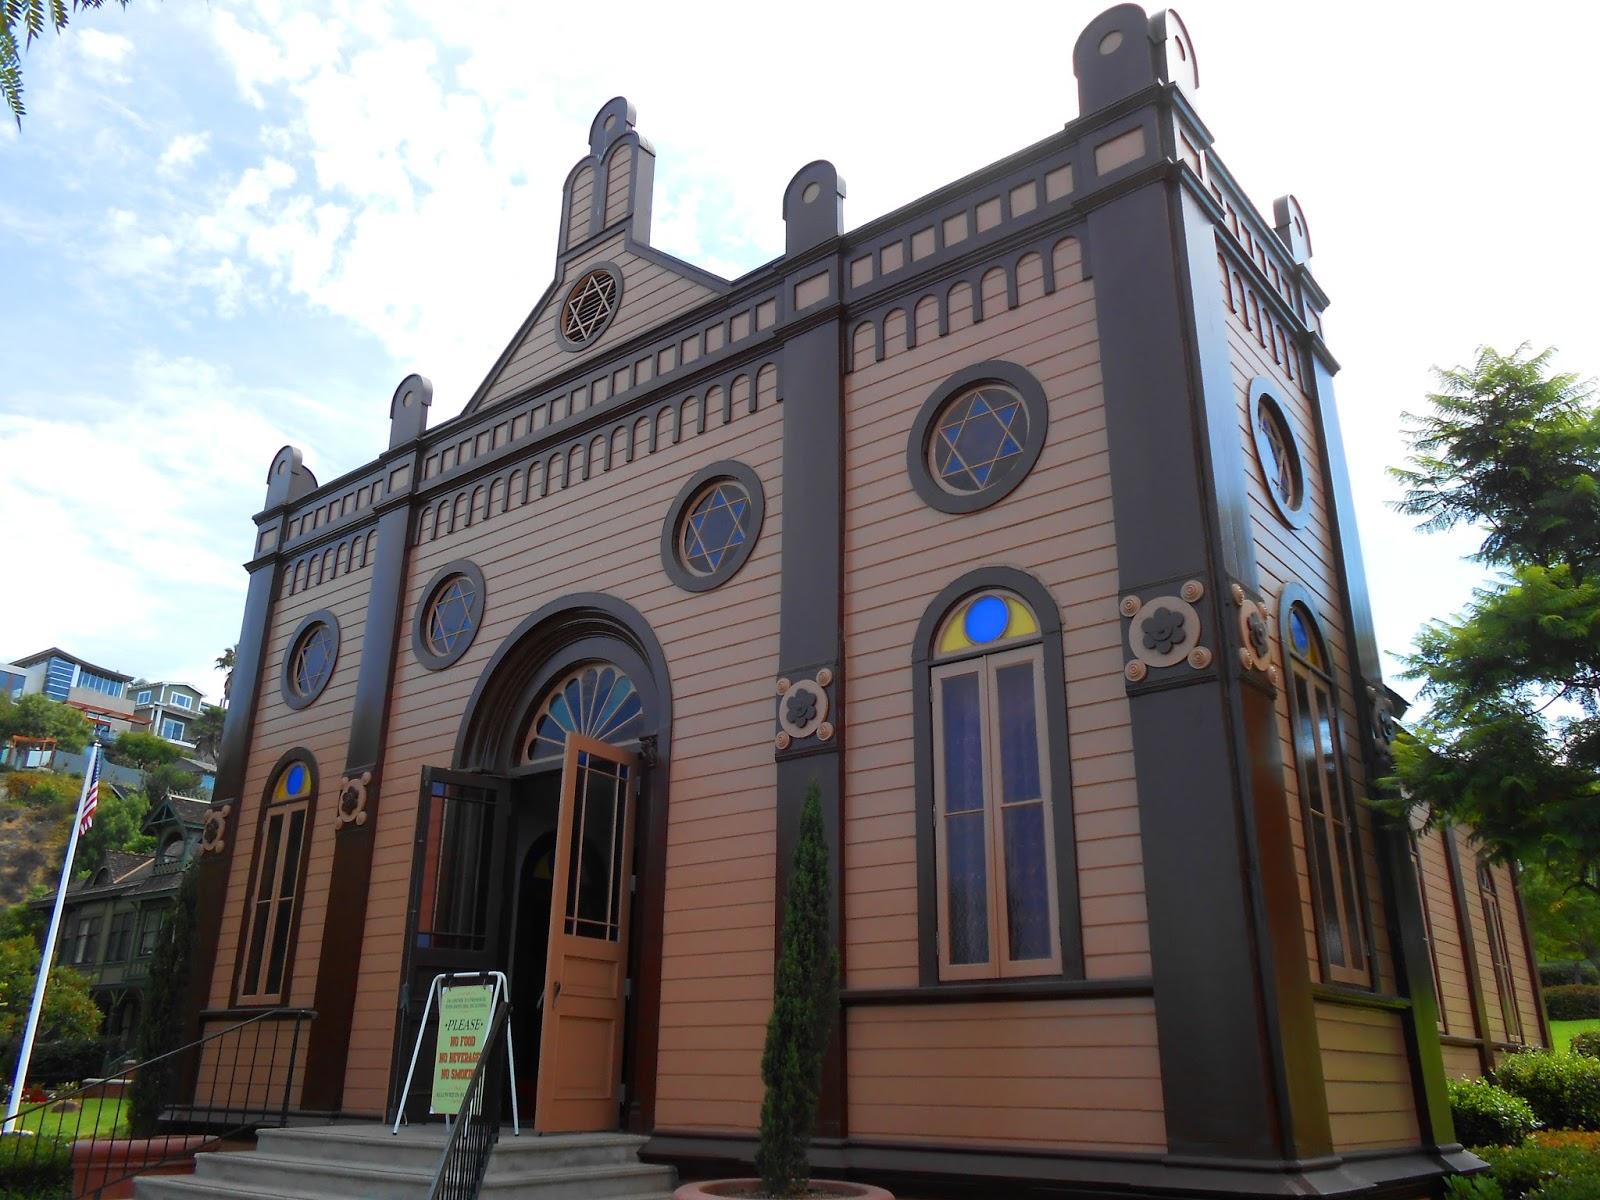 Sinagoga Beth Israel